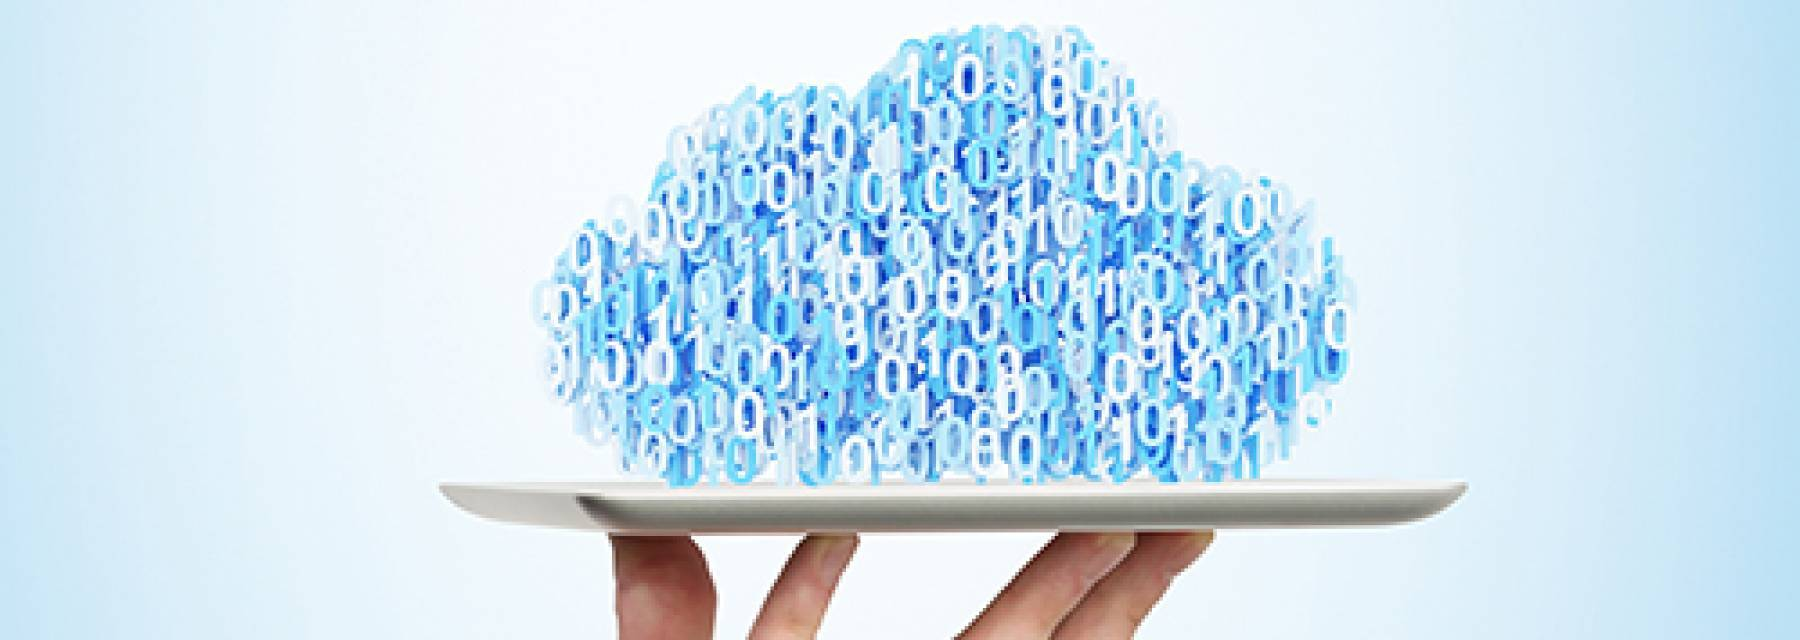 Alibaba-Cloud-Case-Study